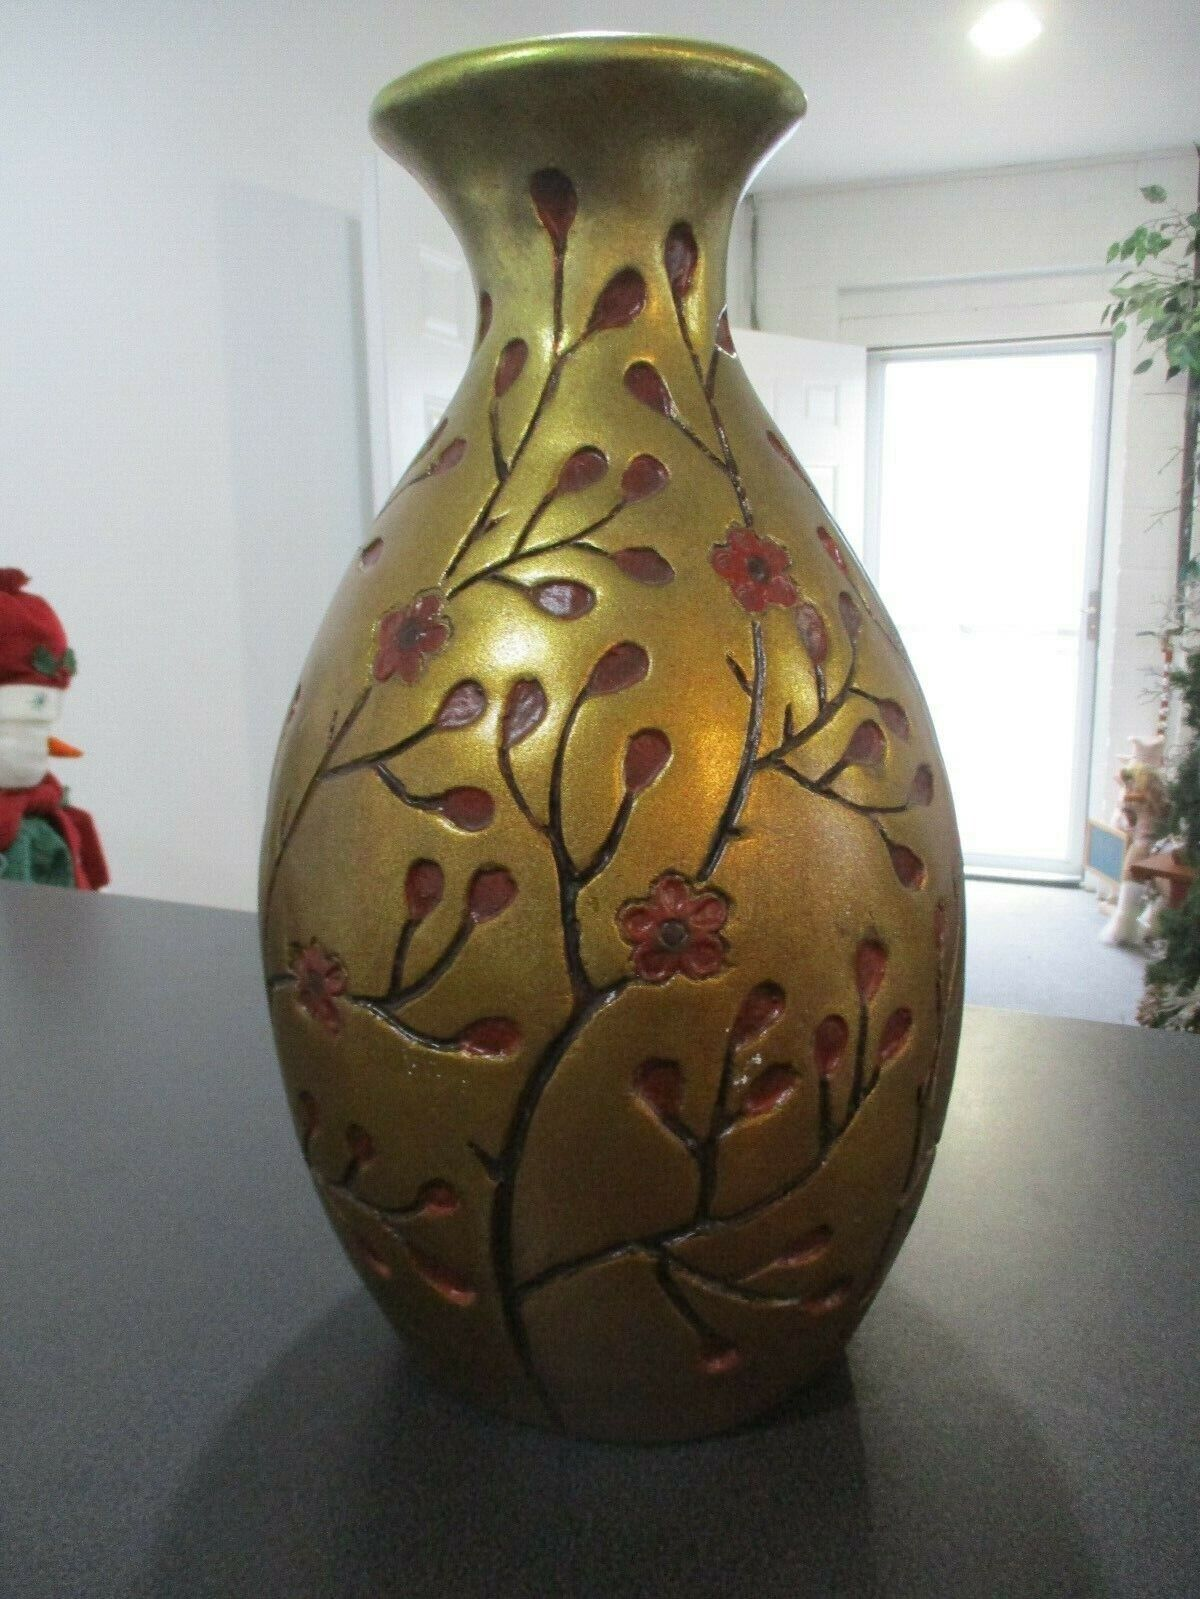 "Pottery Barn 18.5"" Gold Cherry Blossom Vase"